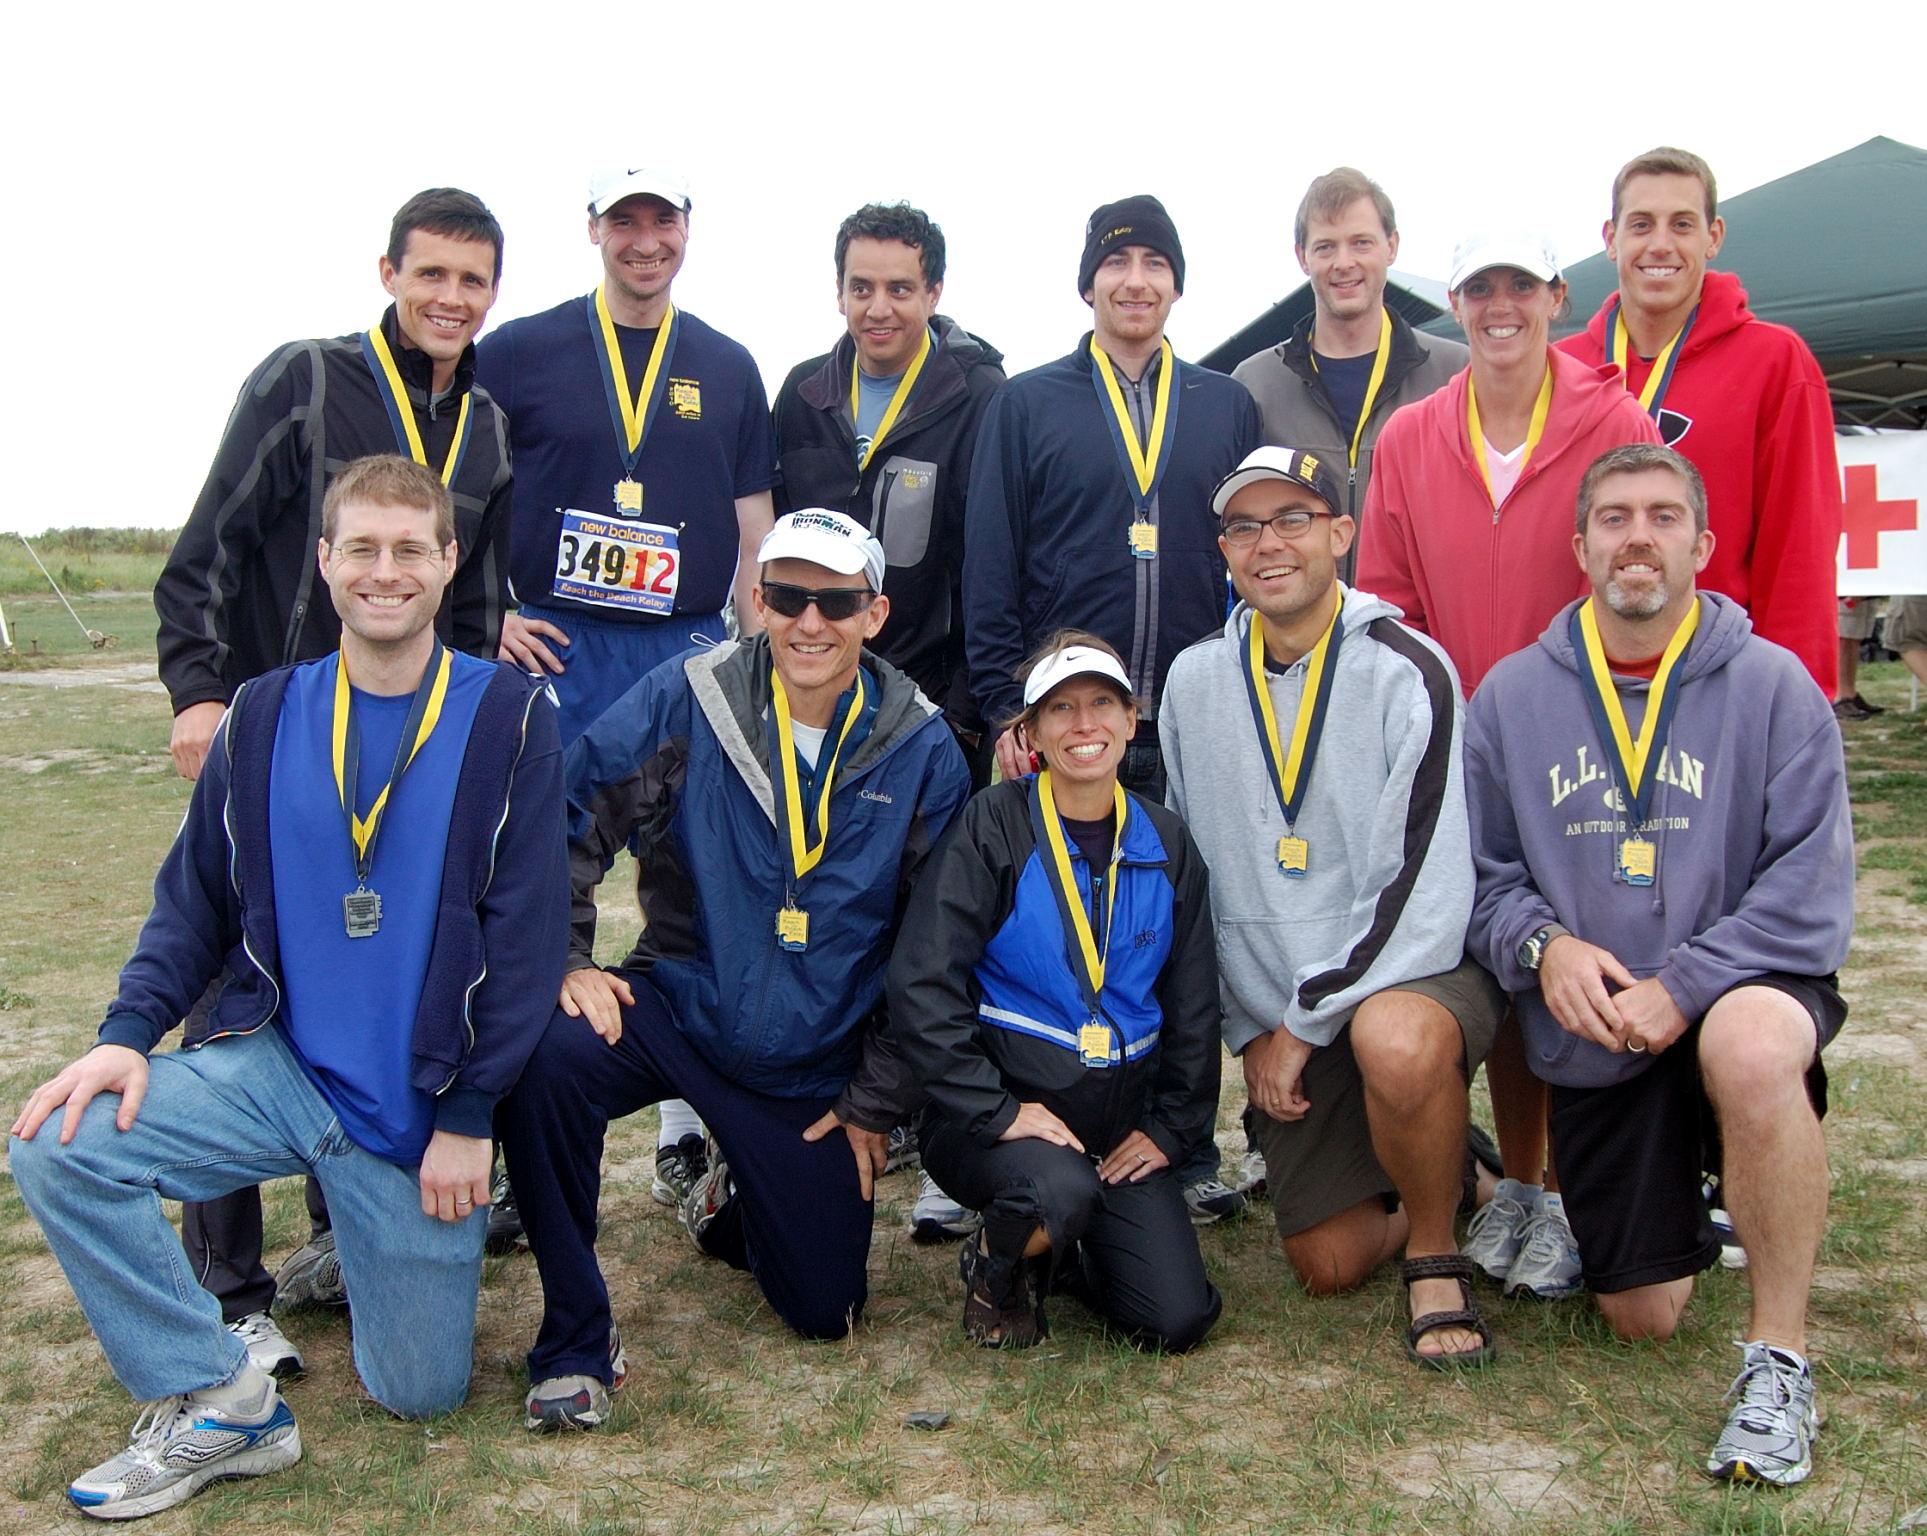 Team NEEP at the finish